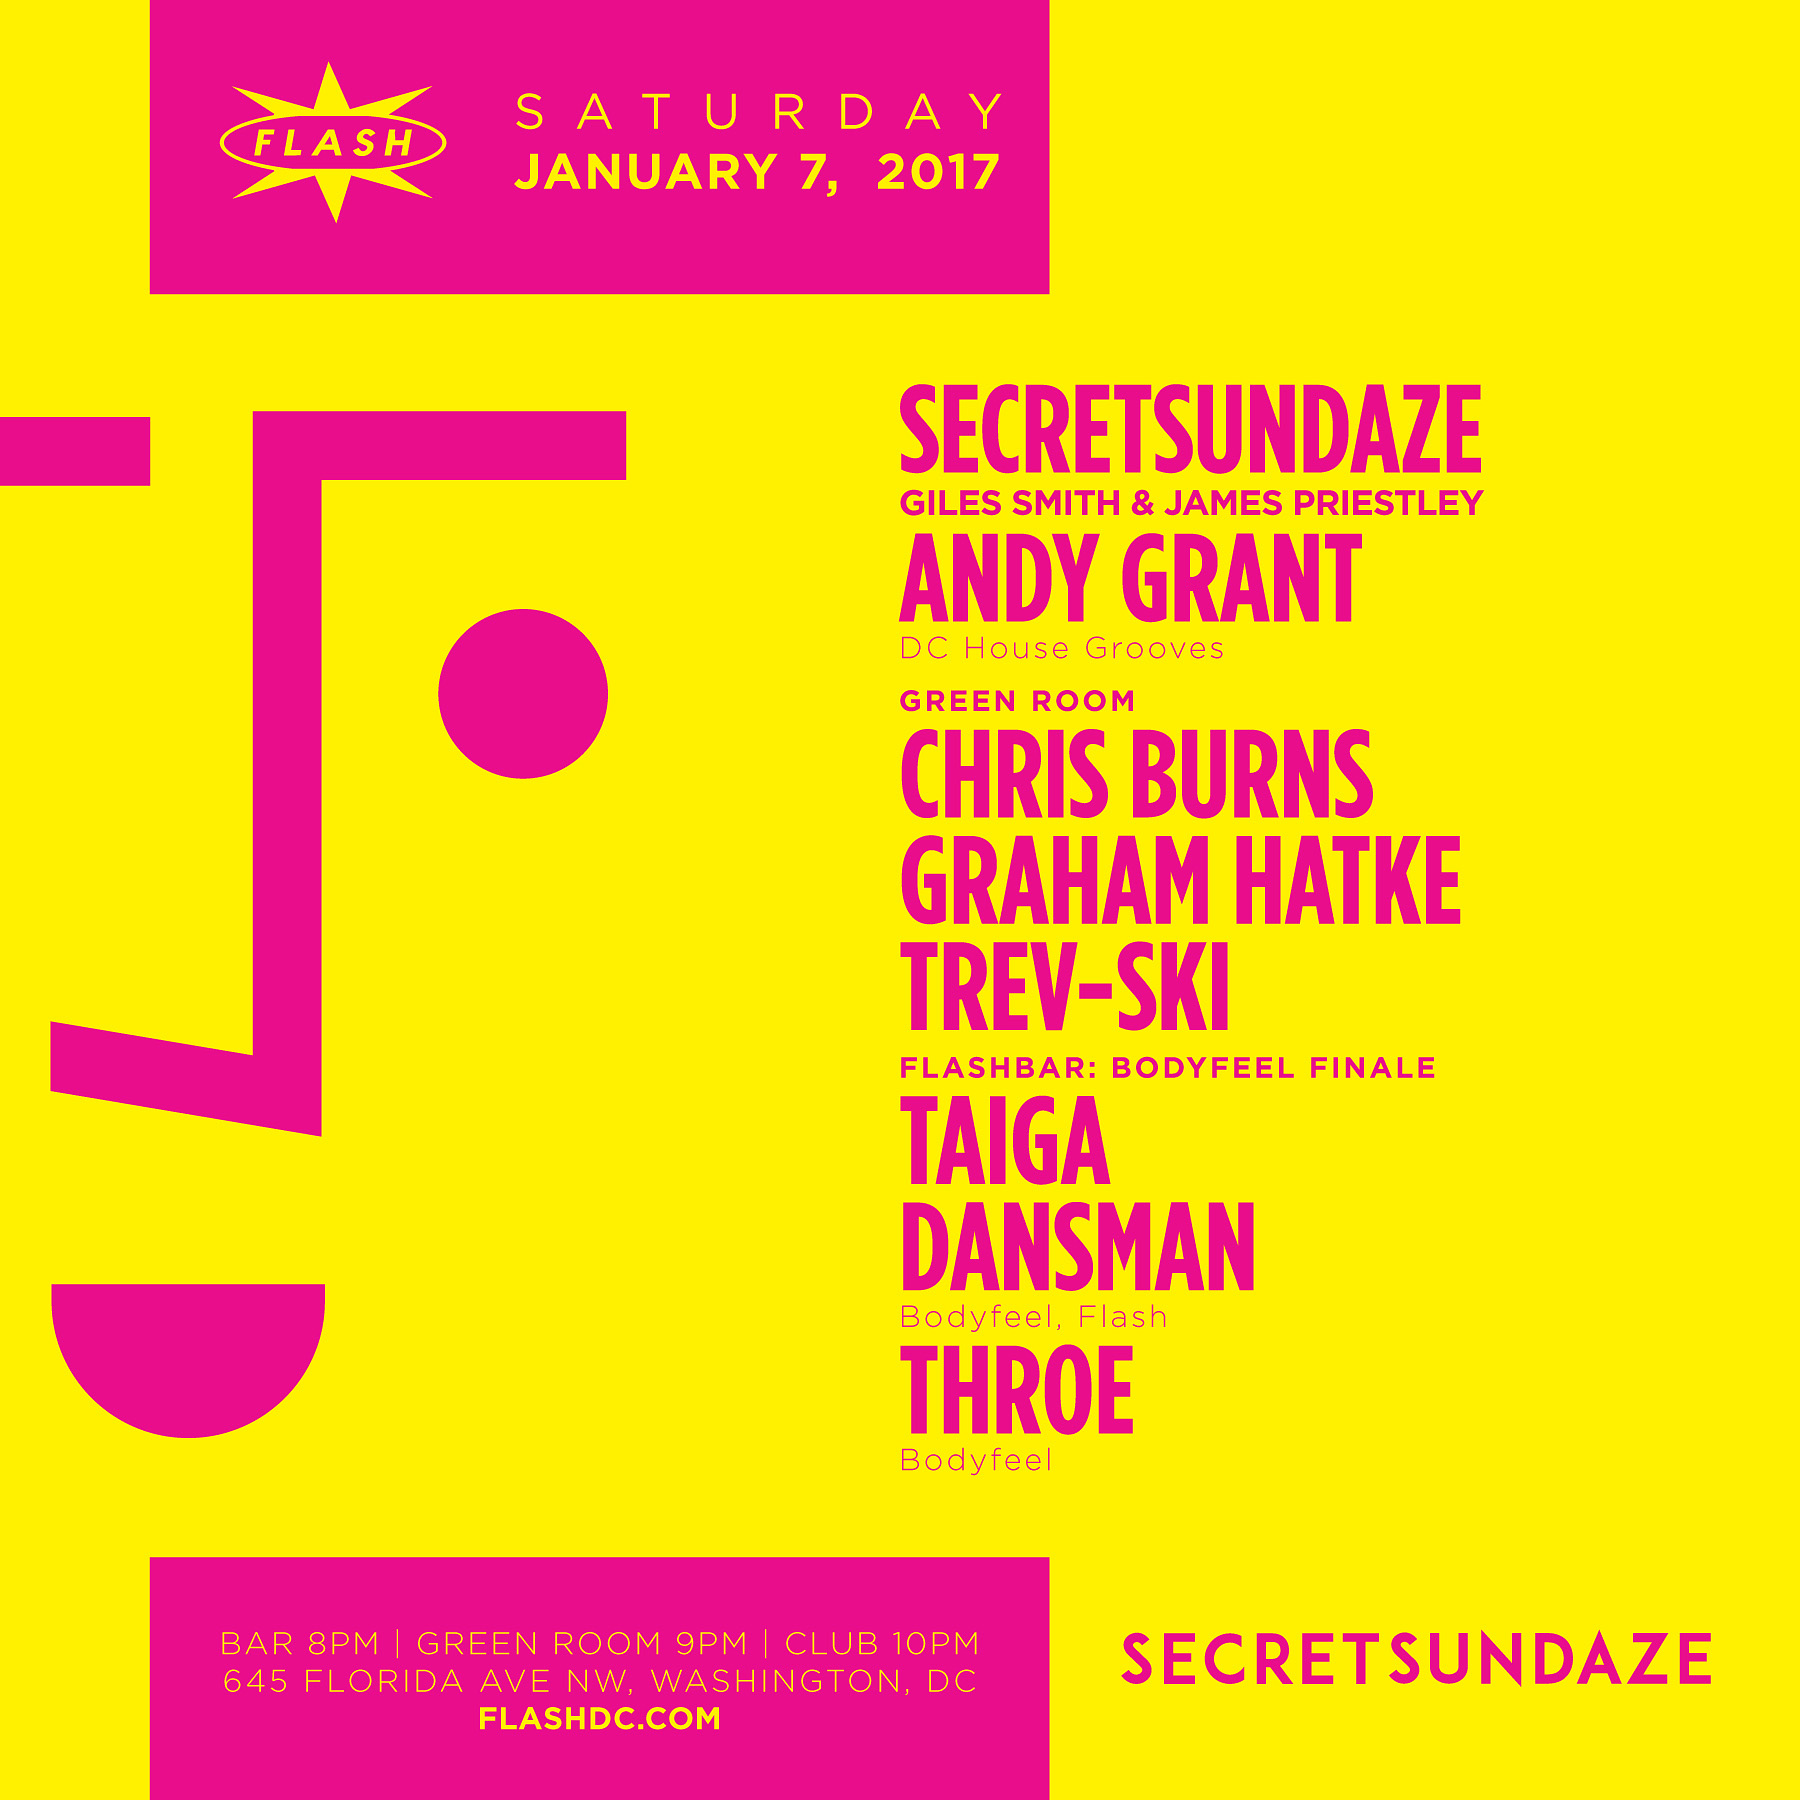 secretsundaze: Giles Smith & James Priestley event thumbnail